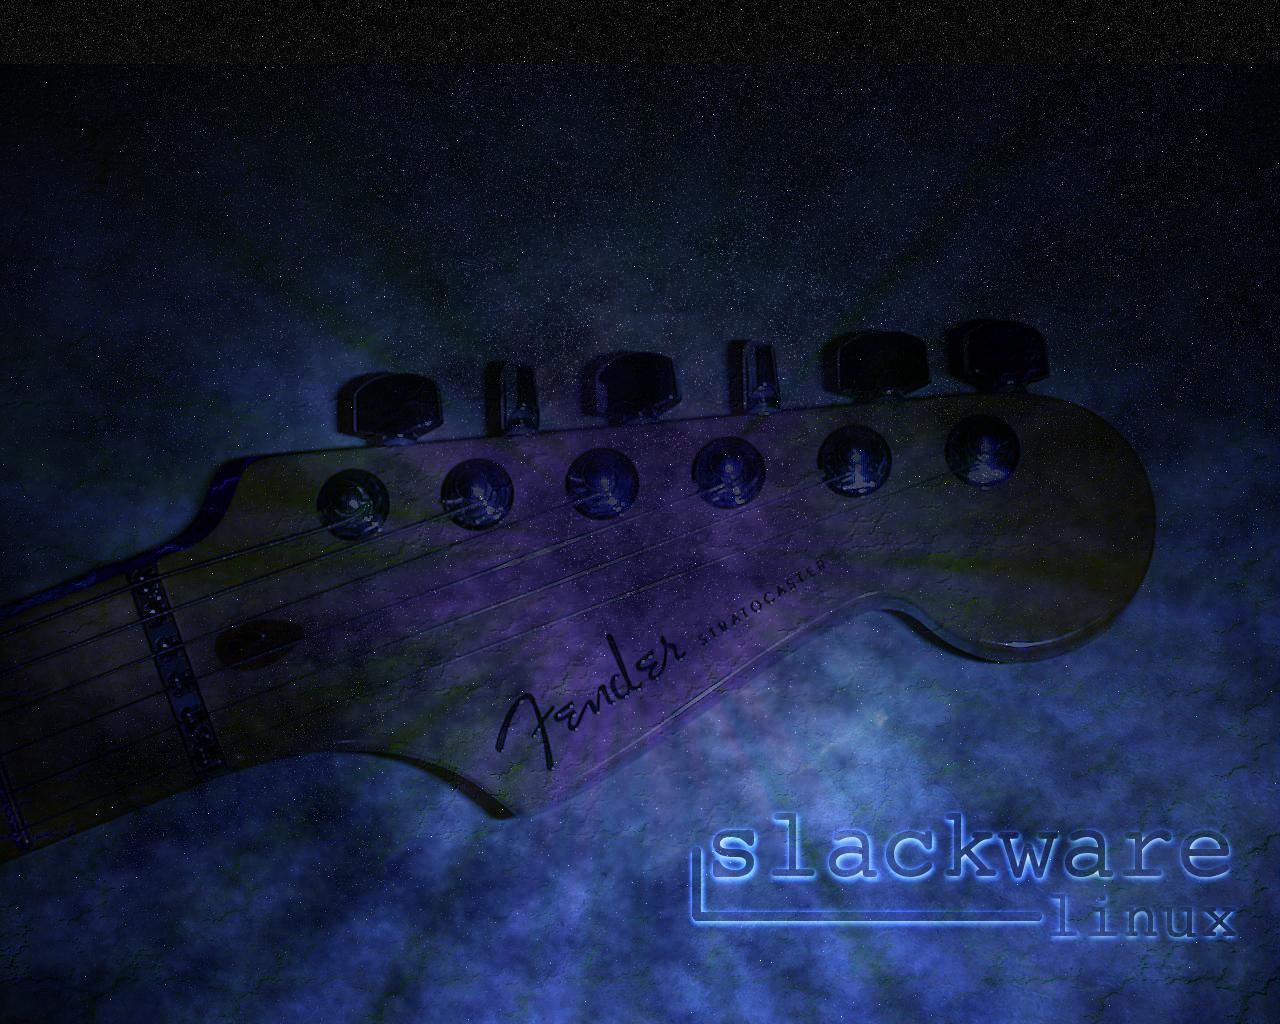 Slackware Linux Wallpaper